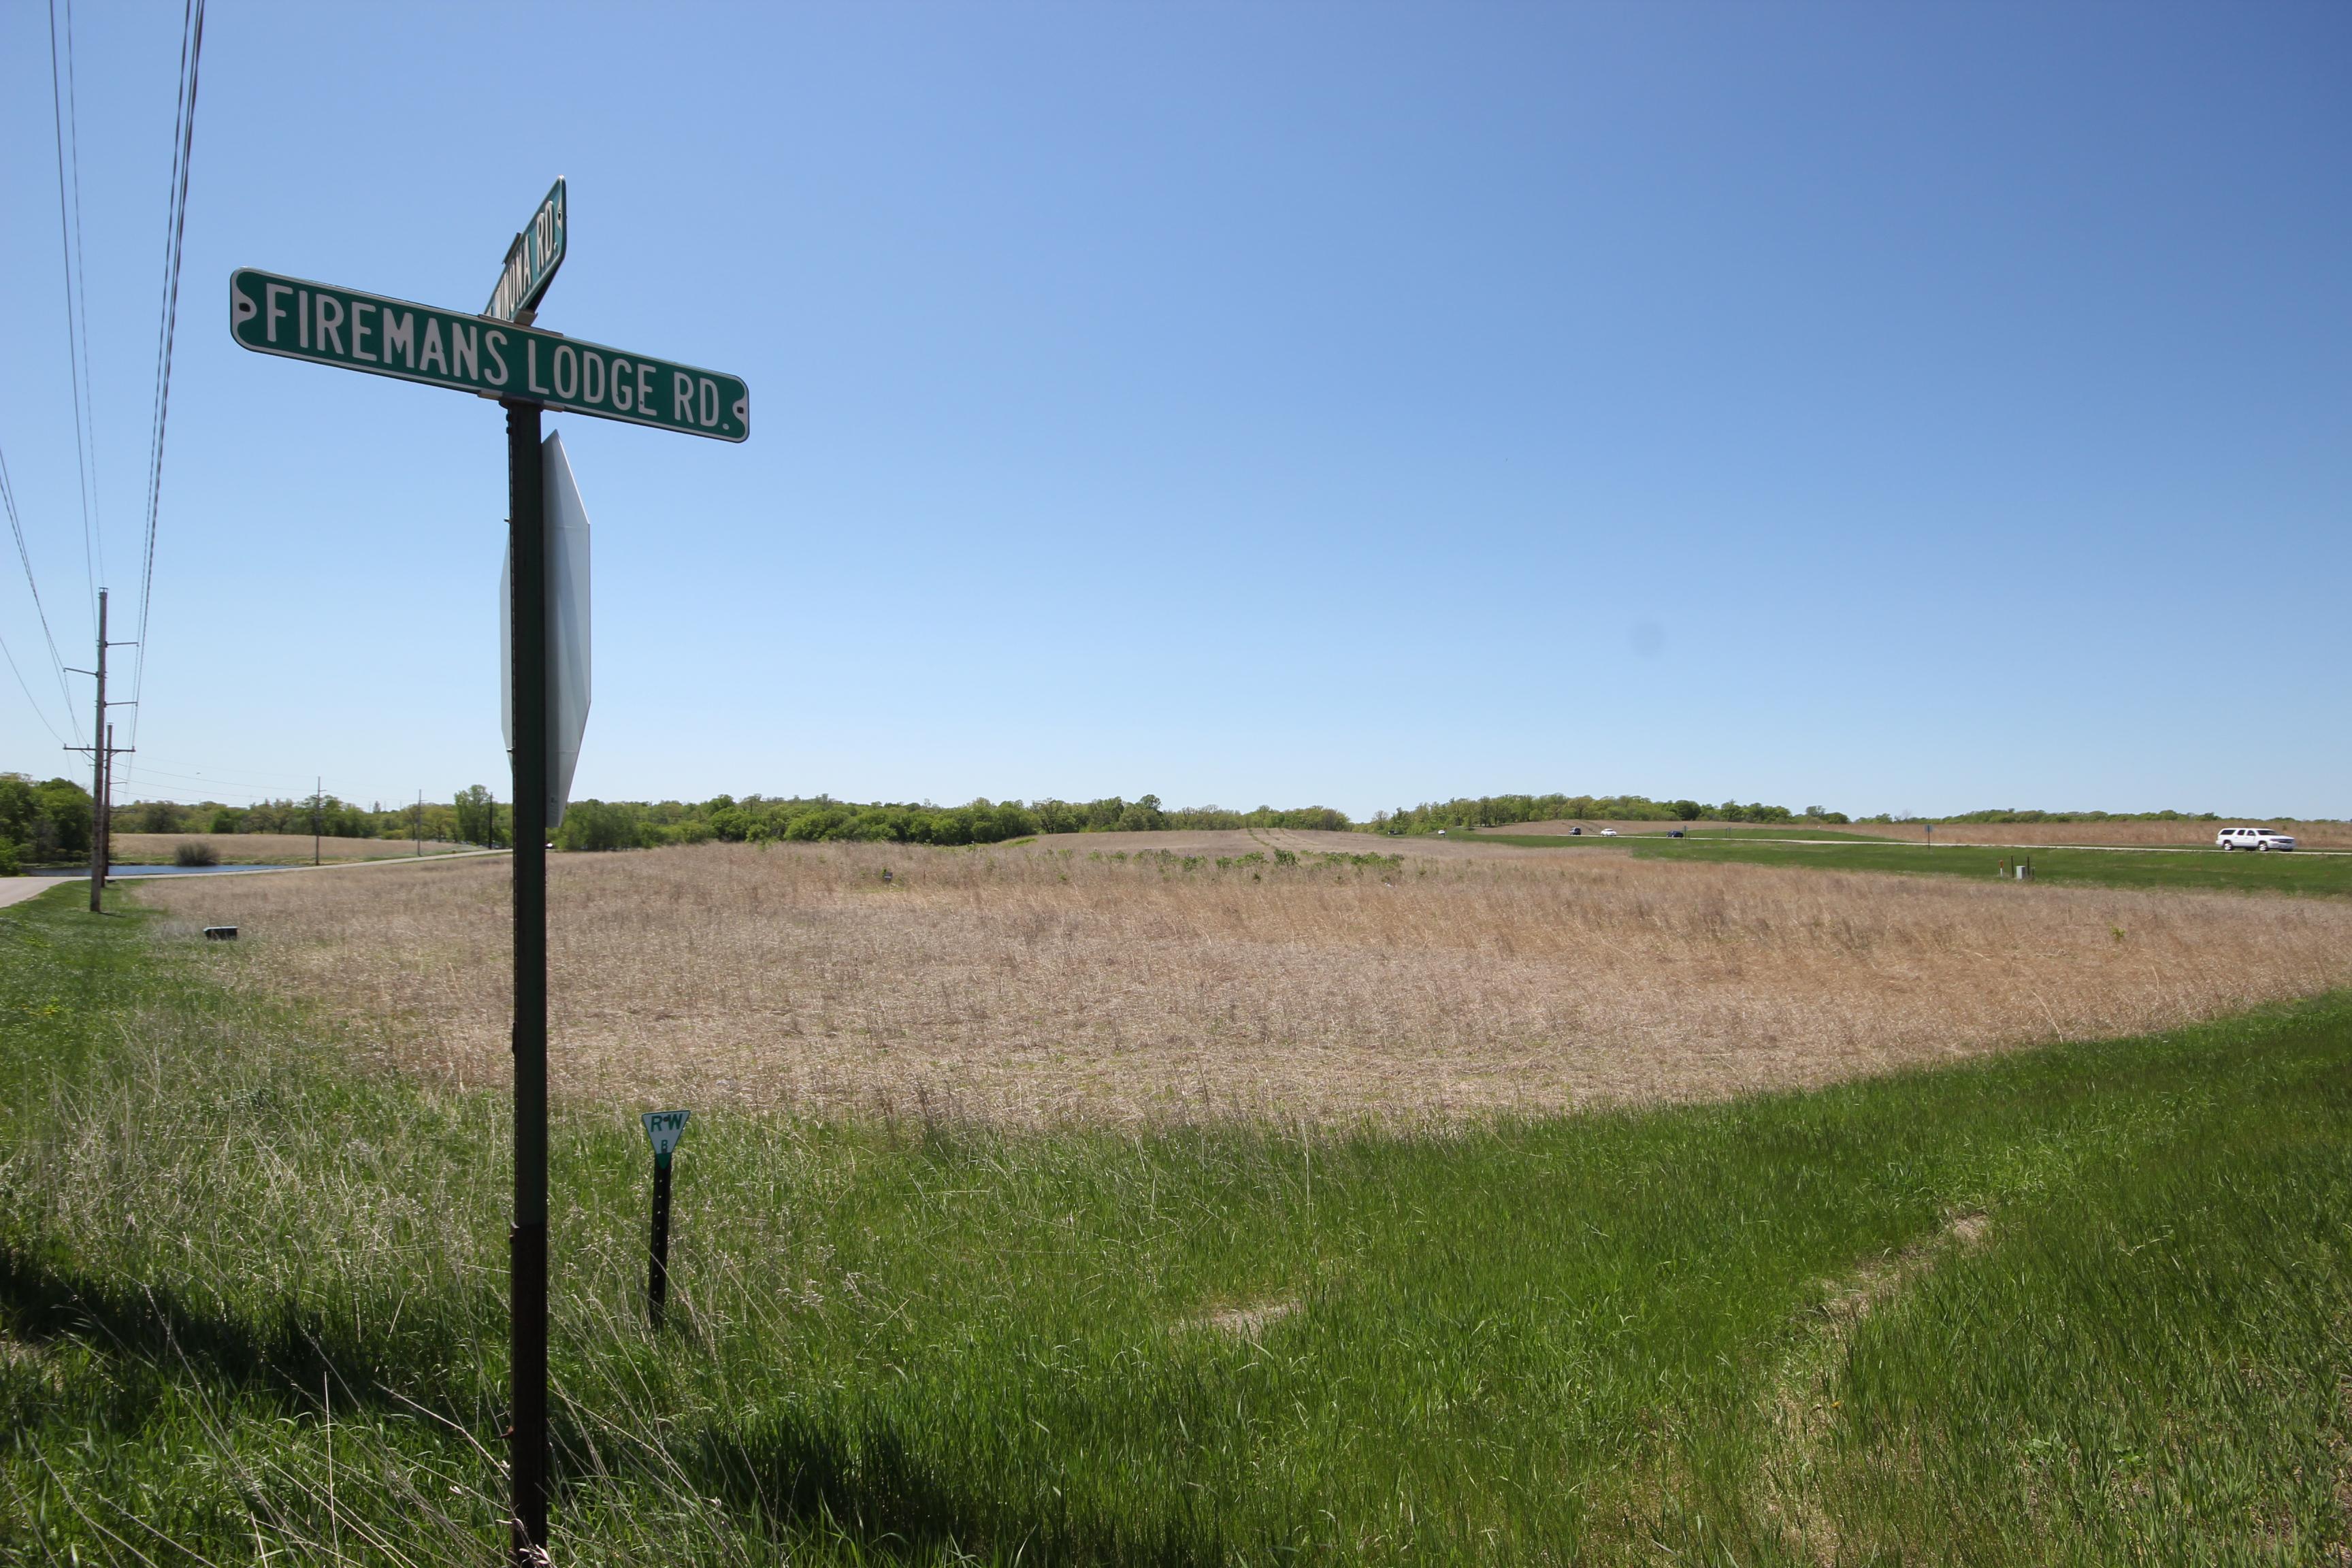 Firemens Lodge Road SW, Alexandria, Minnesota 56308